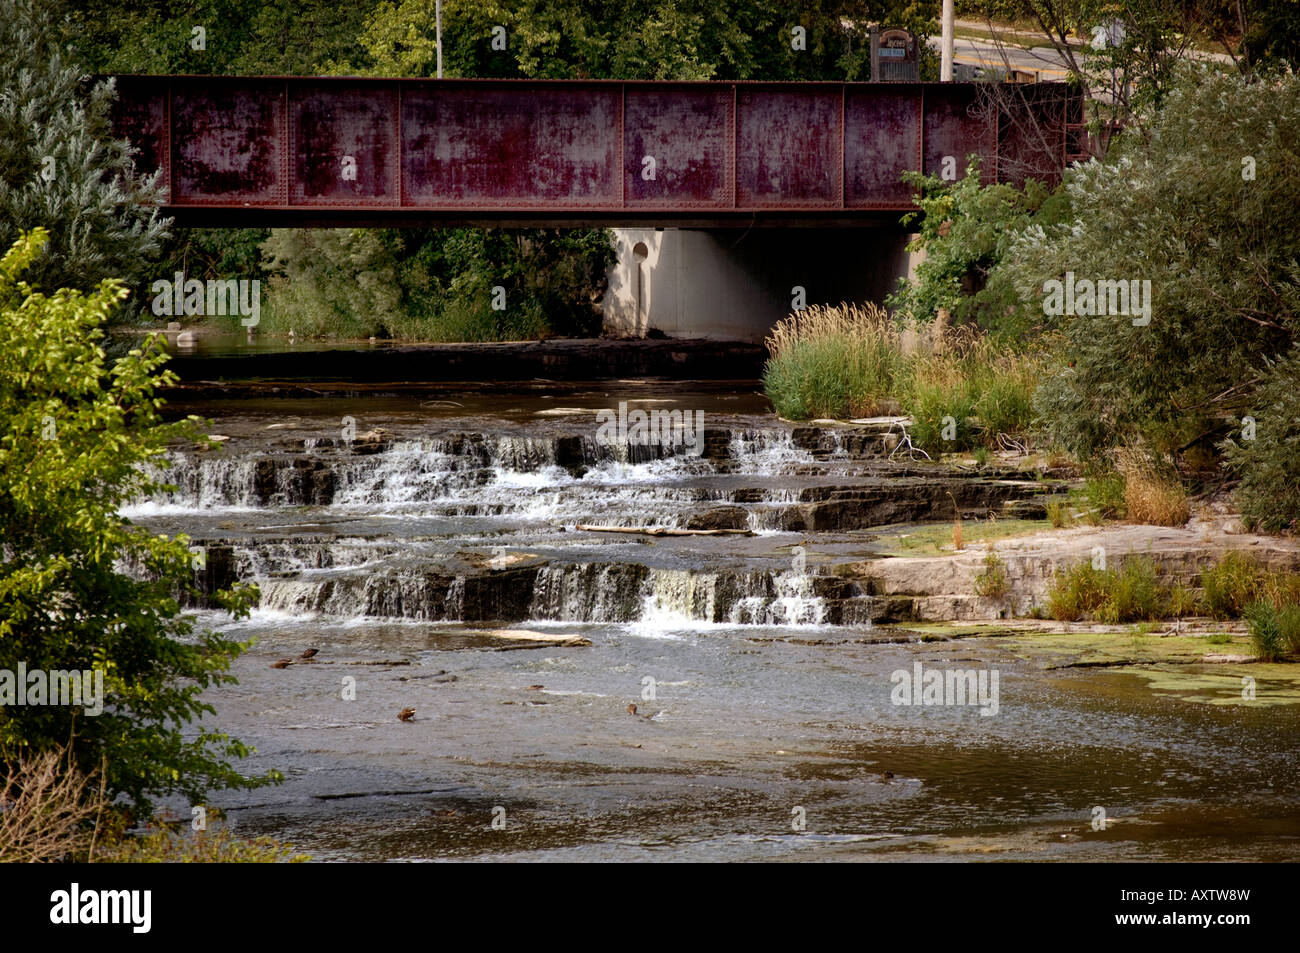 The waterfall on the Sheboygan River in Sheboygan Falls Wisconsin Stock Photo